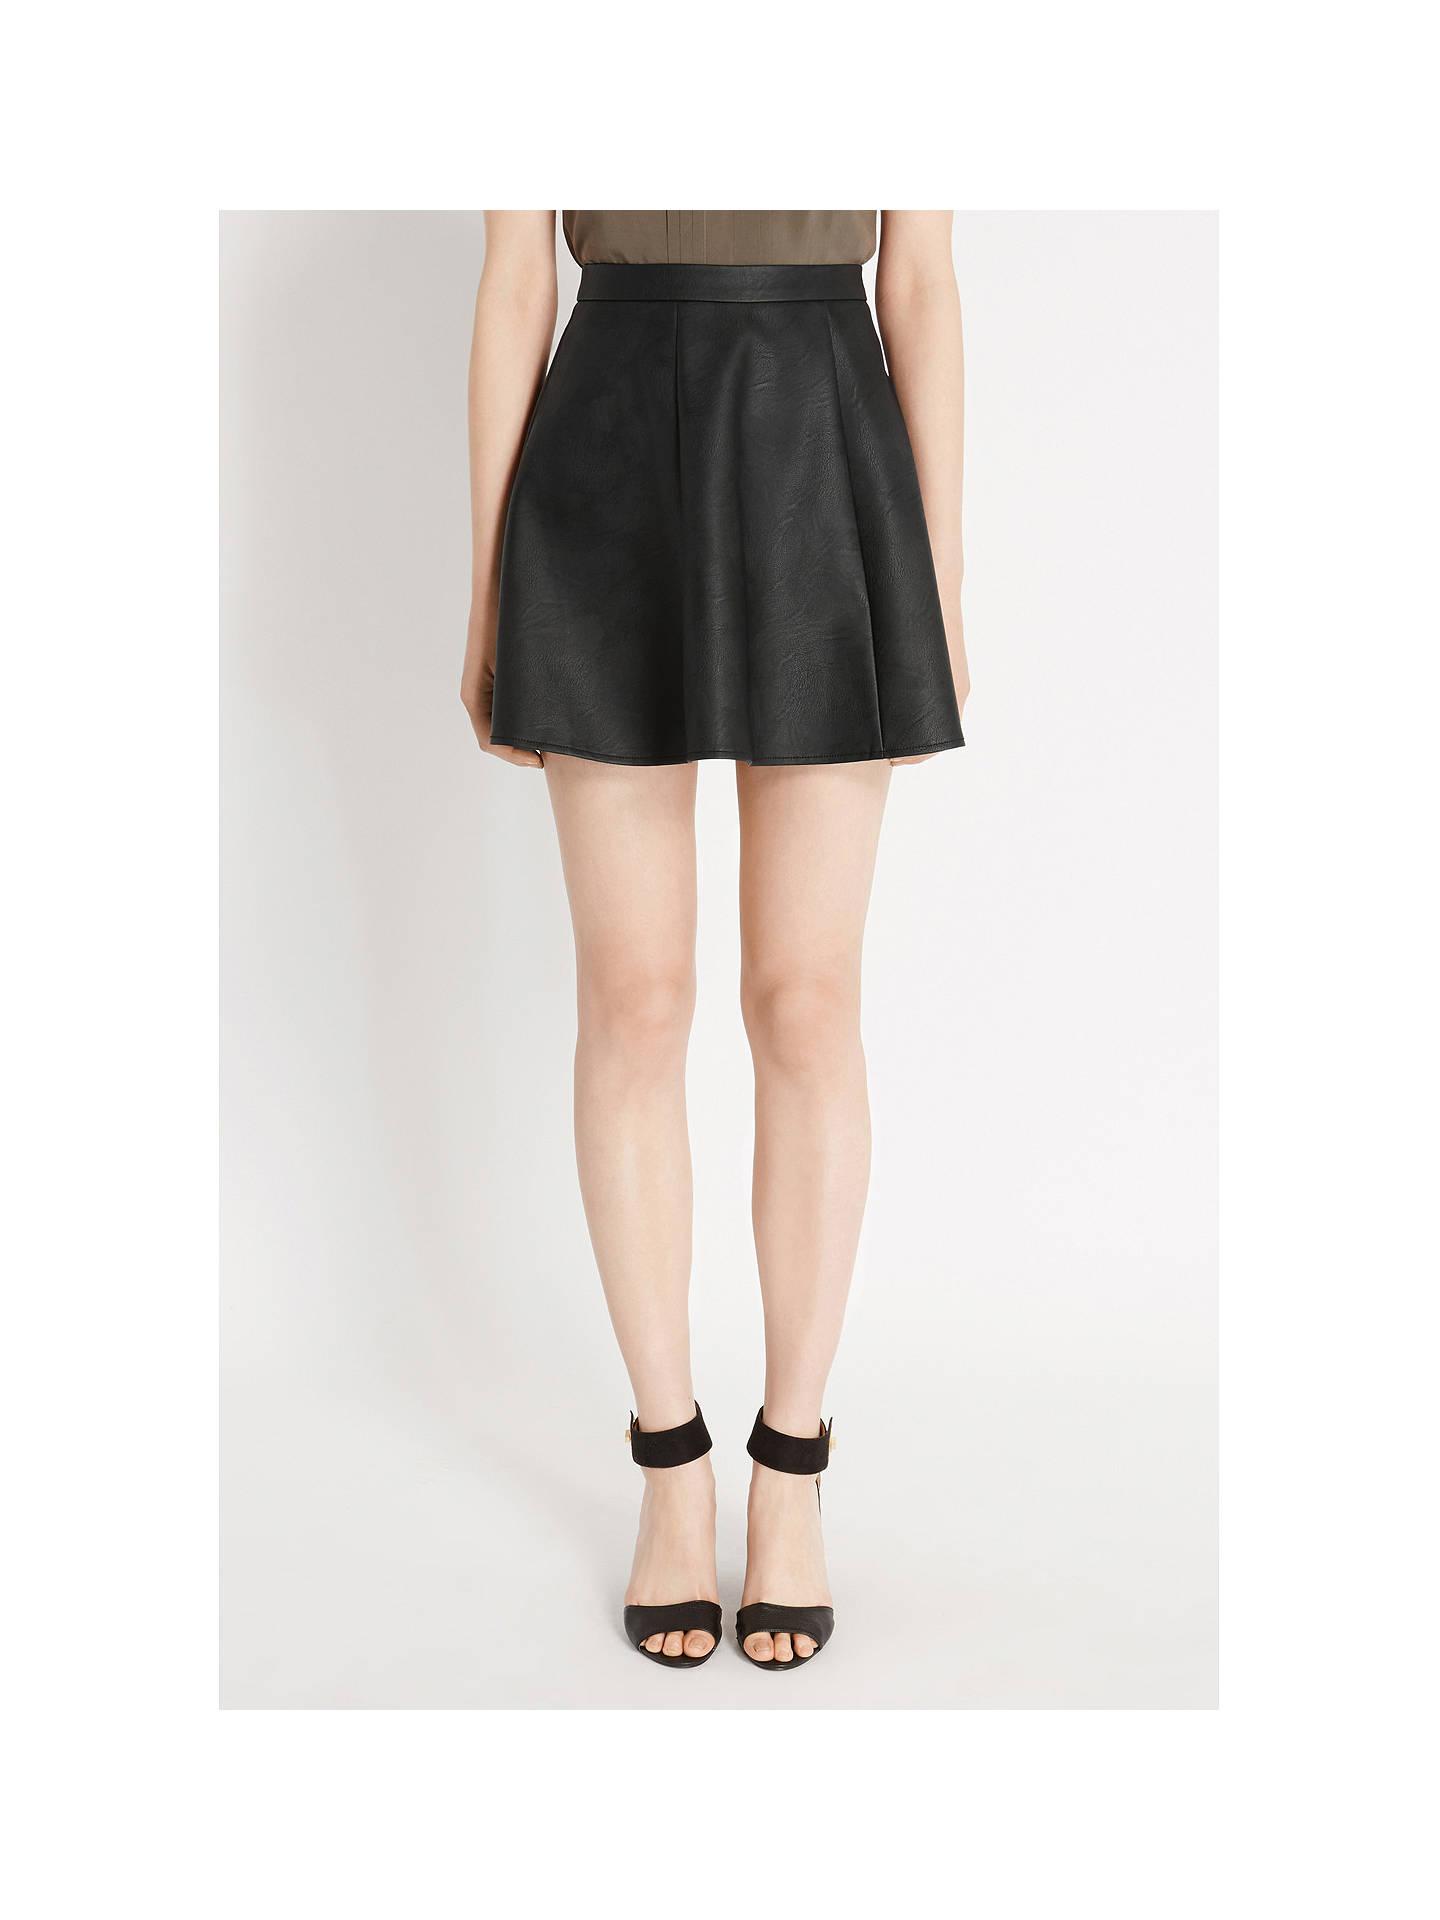 e26632c06529 ... Buy Oasis Bailey Faux Leather Skater Skirt, Black, 8 Online at  johnlewis.com ...